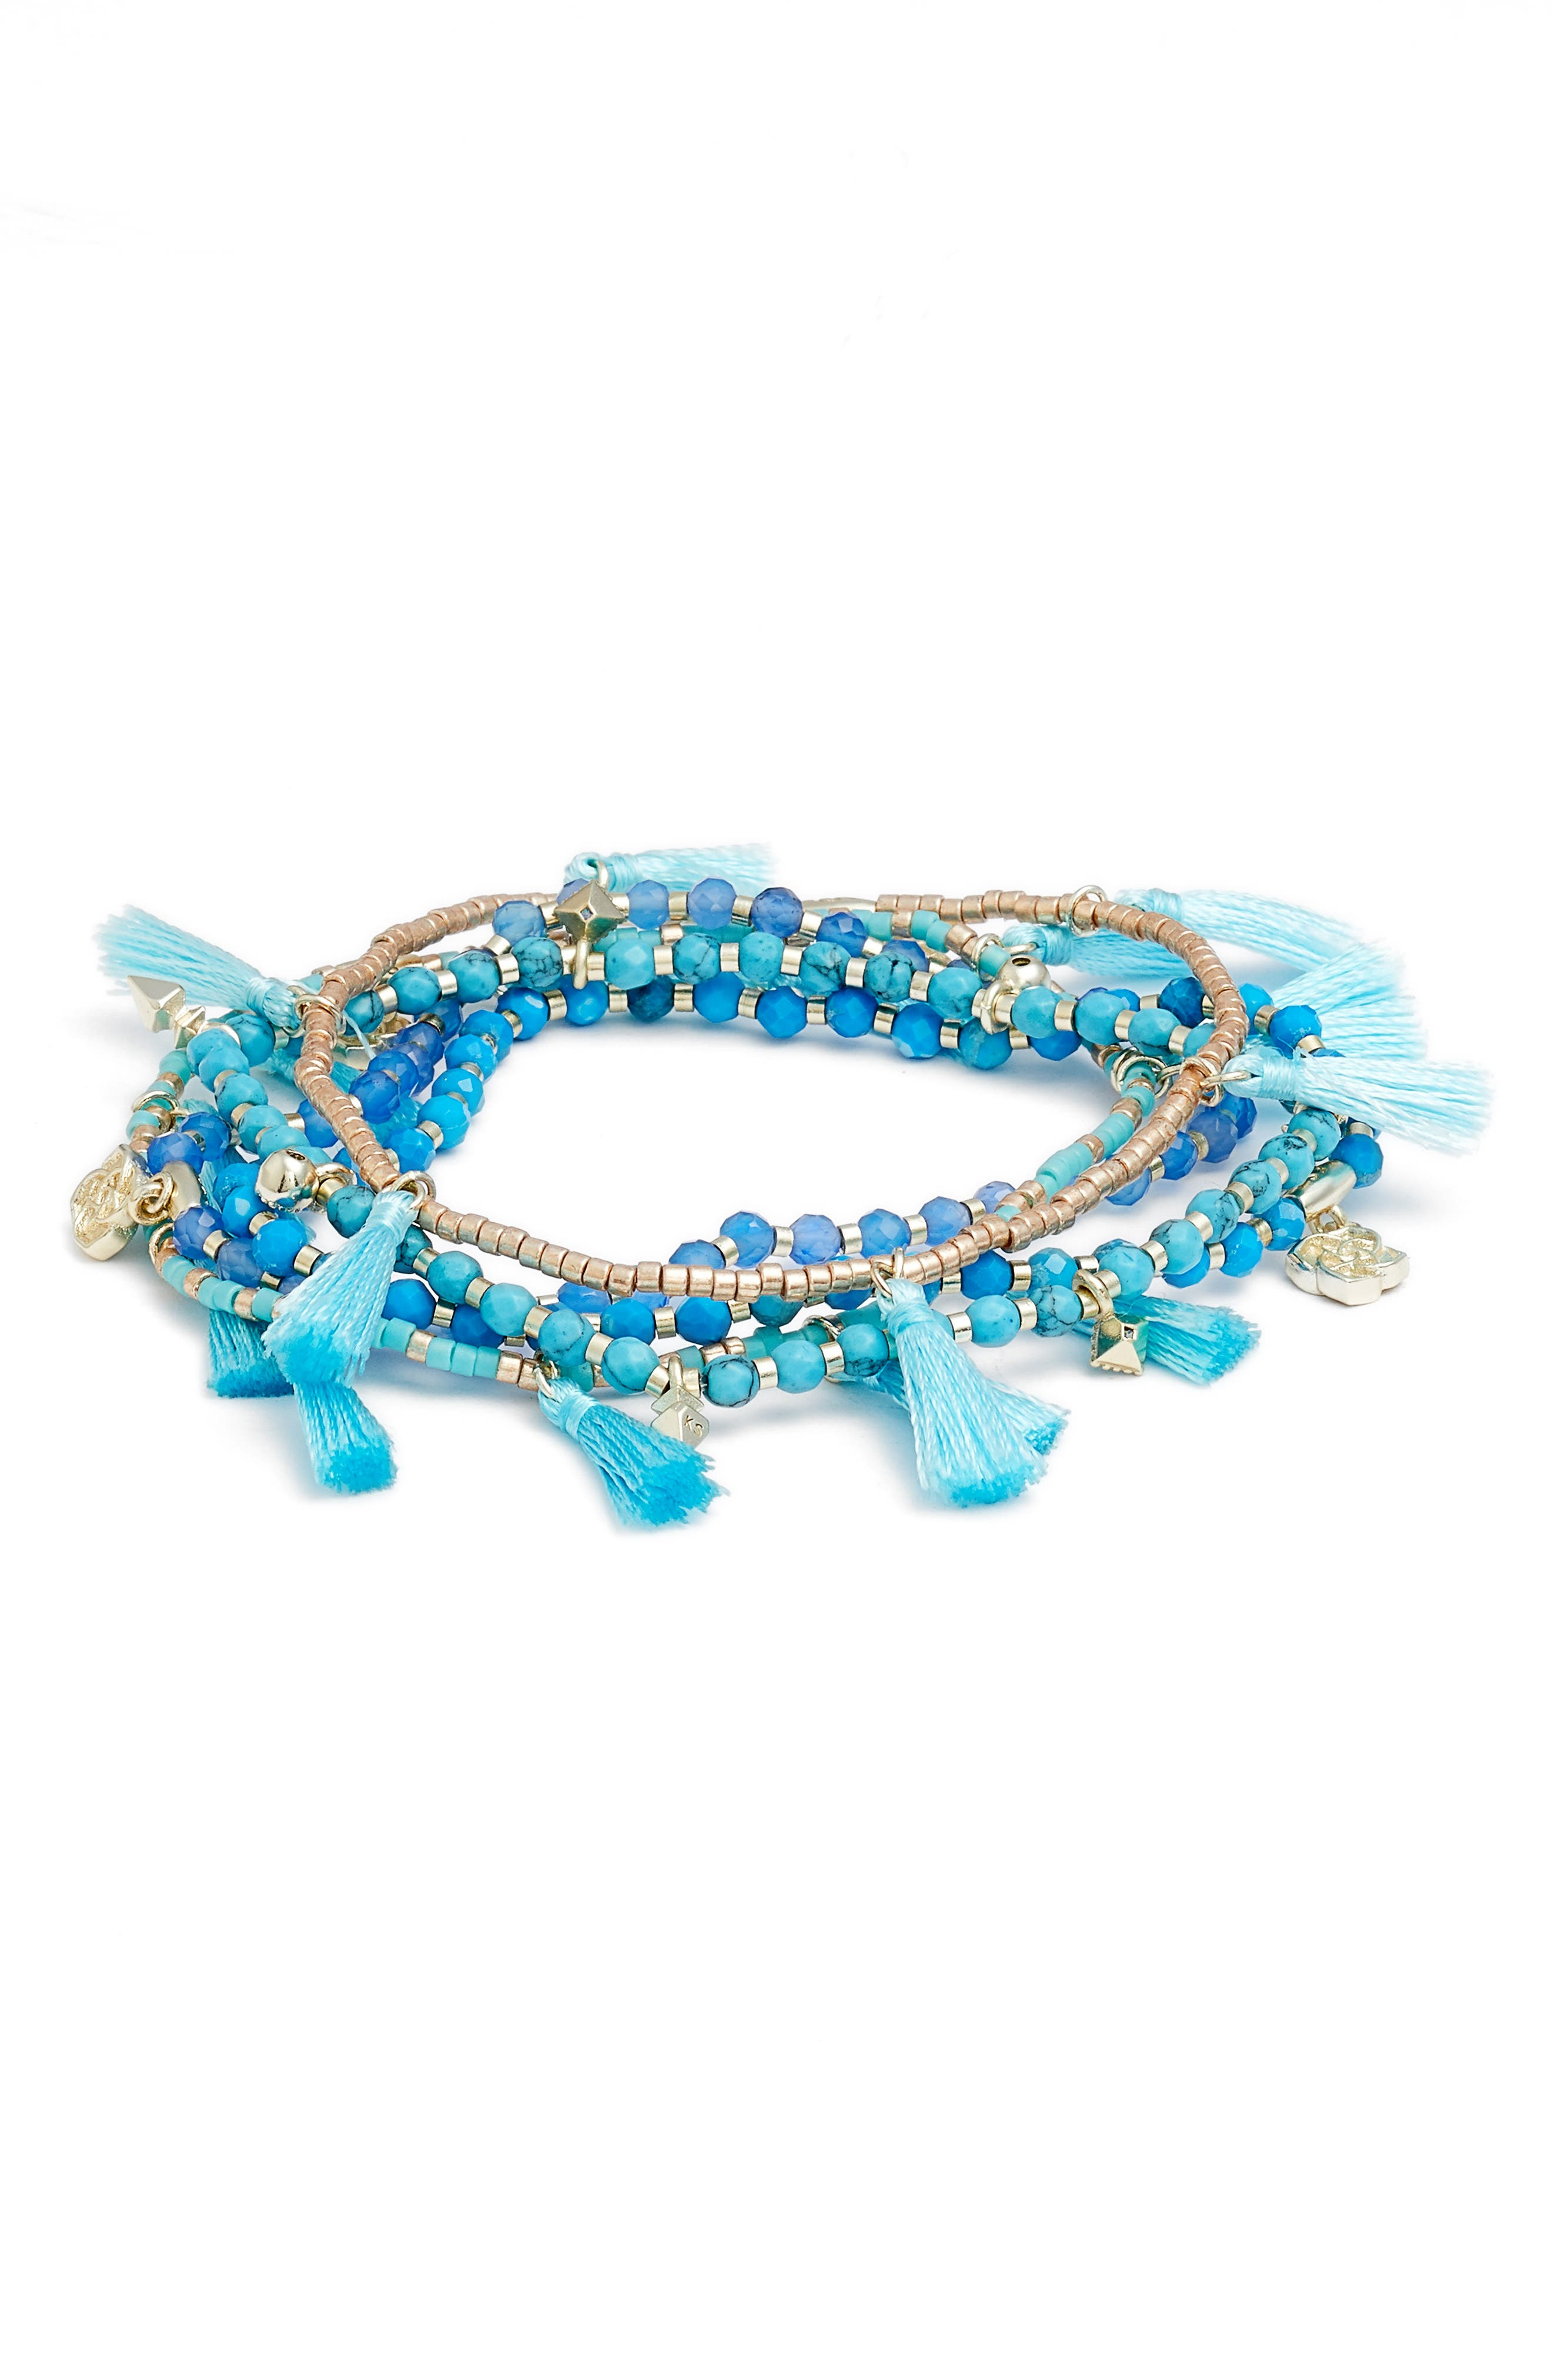 Julie Tassel Bracelet,                             Main thumbnail 1, color,                             AQUA MIX/ GOLD